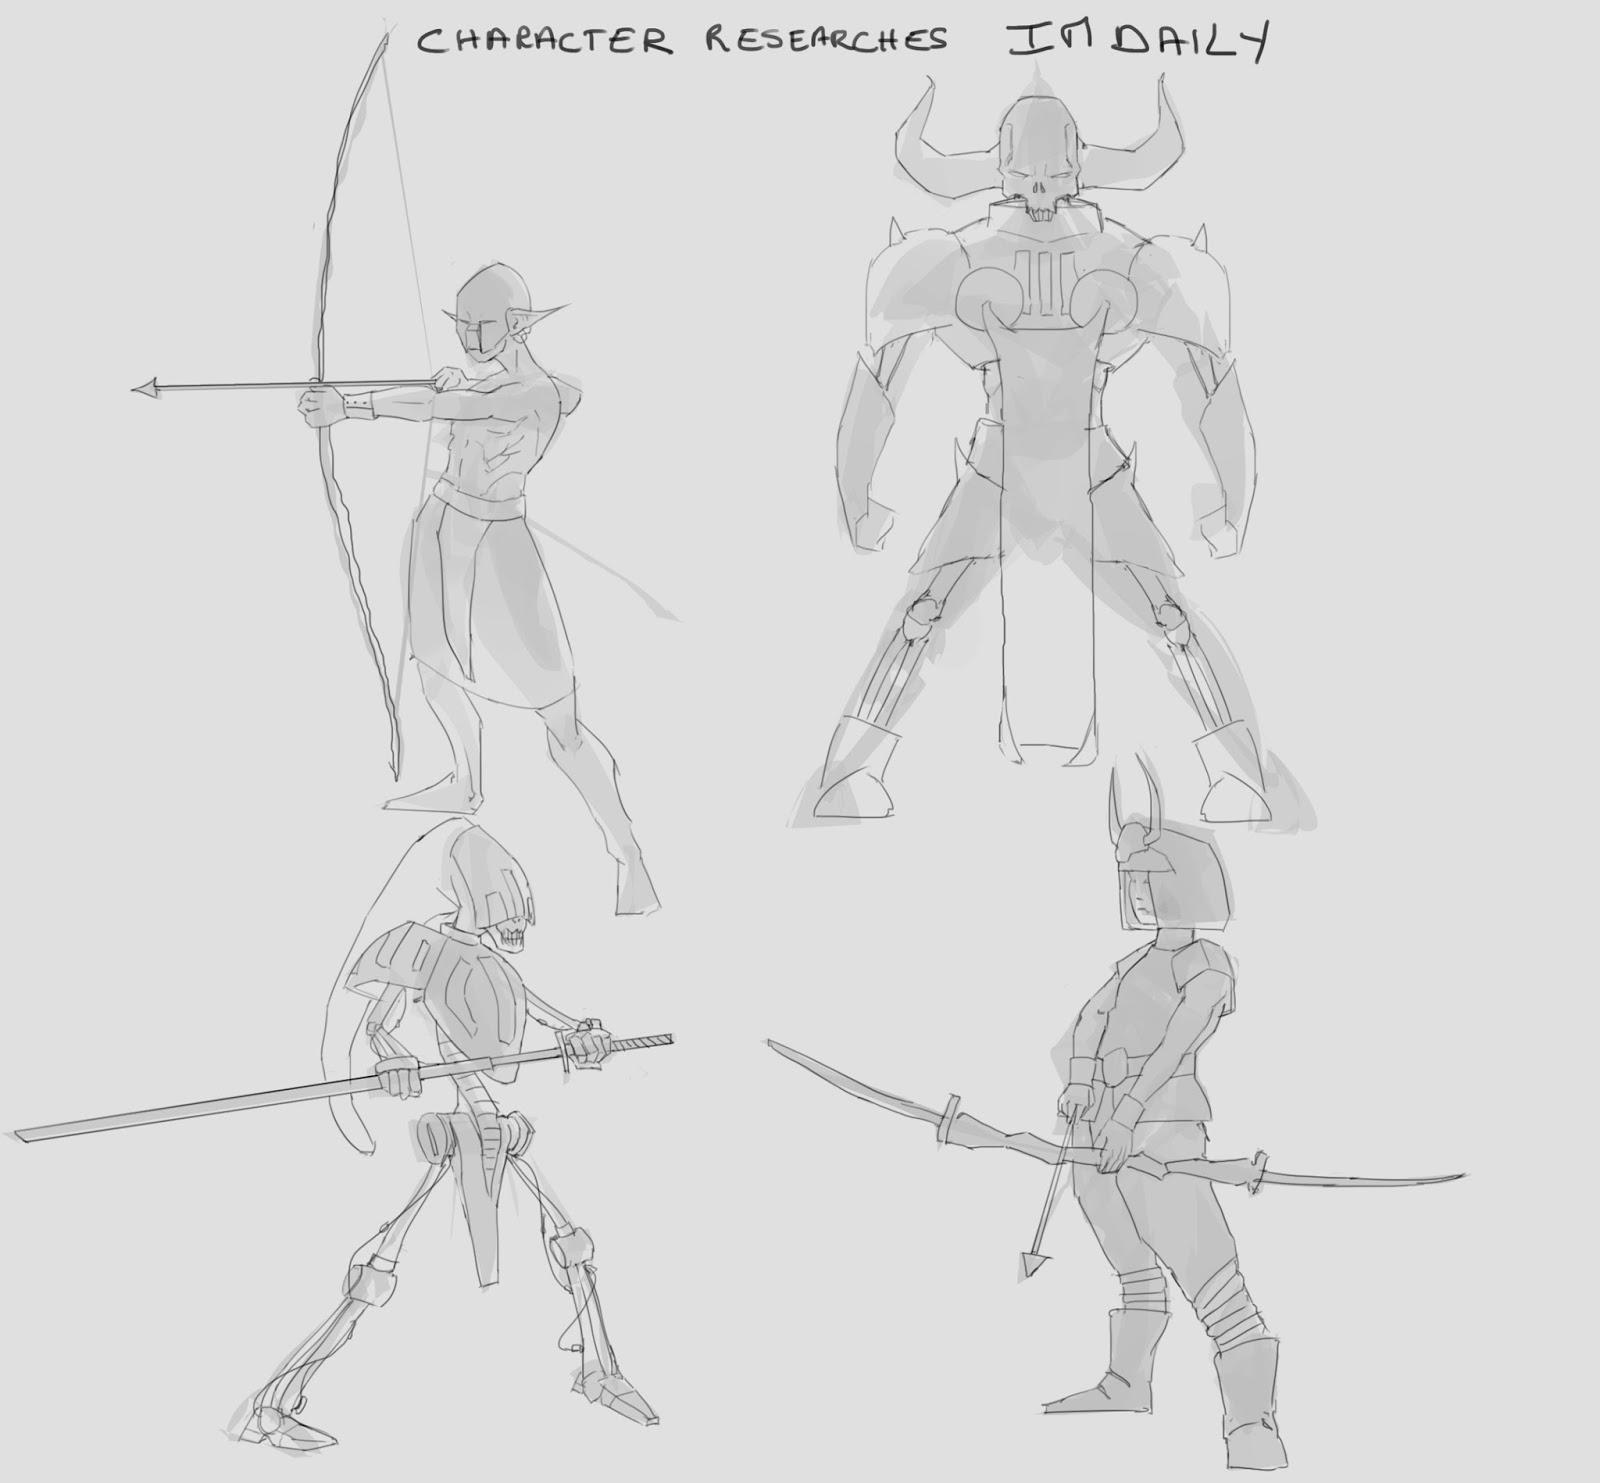 [SPOLYK] - Geometries & sketches 135b